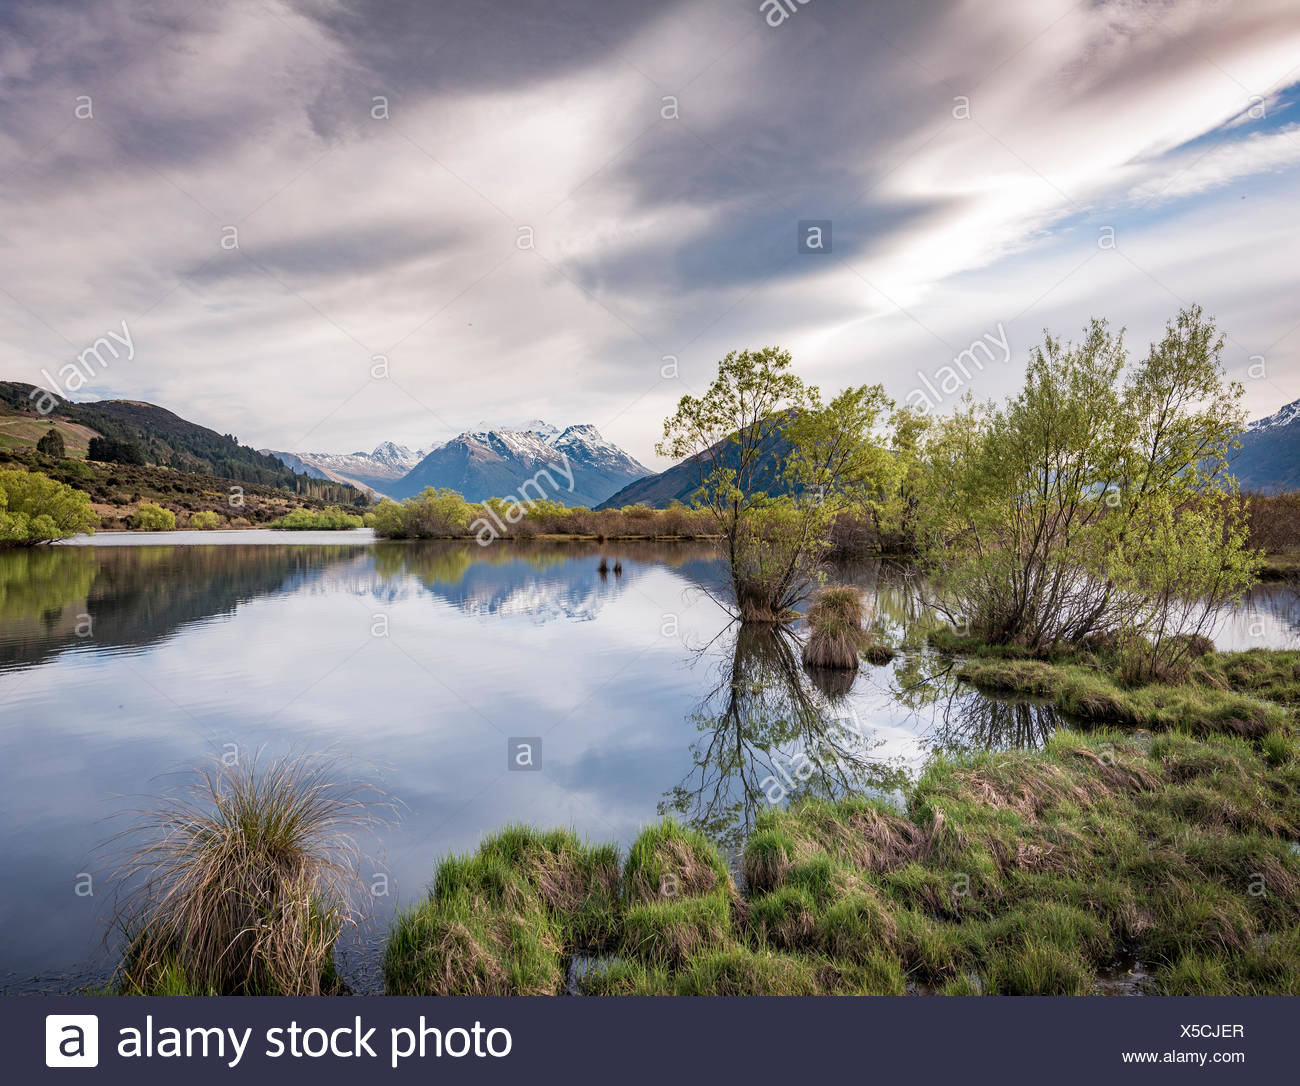 Glenorchy Lagune am hinteren Berge, Glenorchy, in Queenstown, Southland, Neuseeland Stockbild